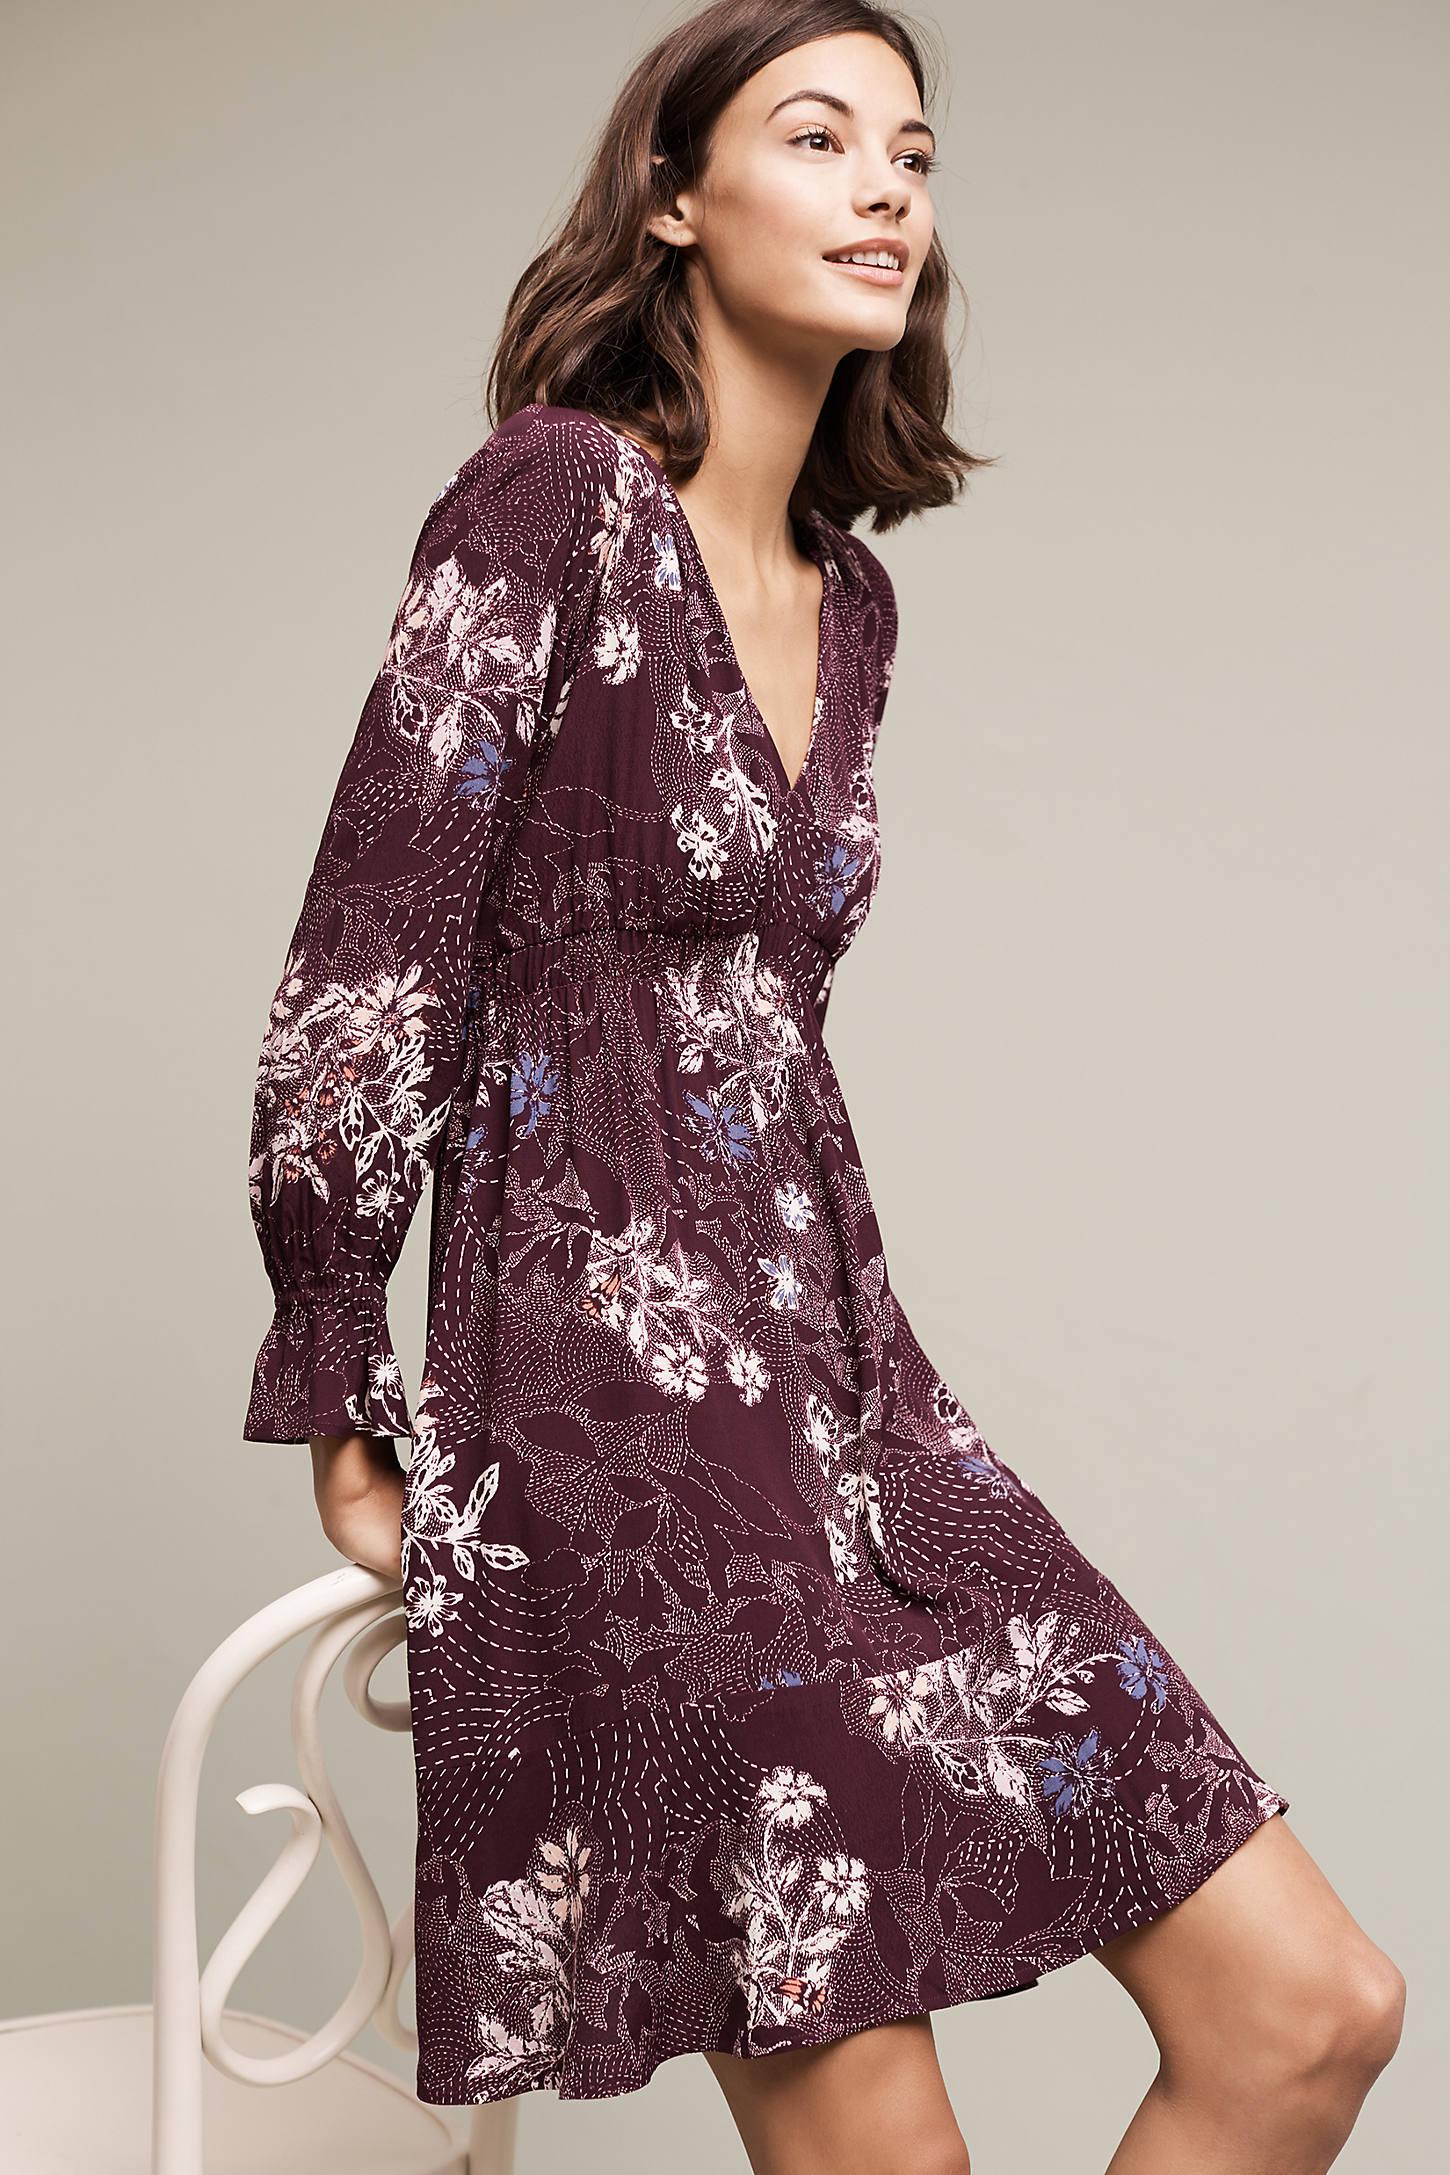 Monaco Tiered Dress